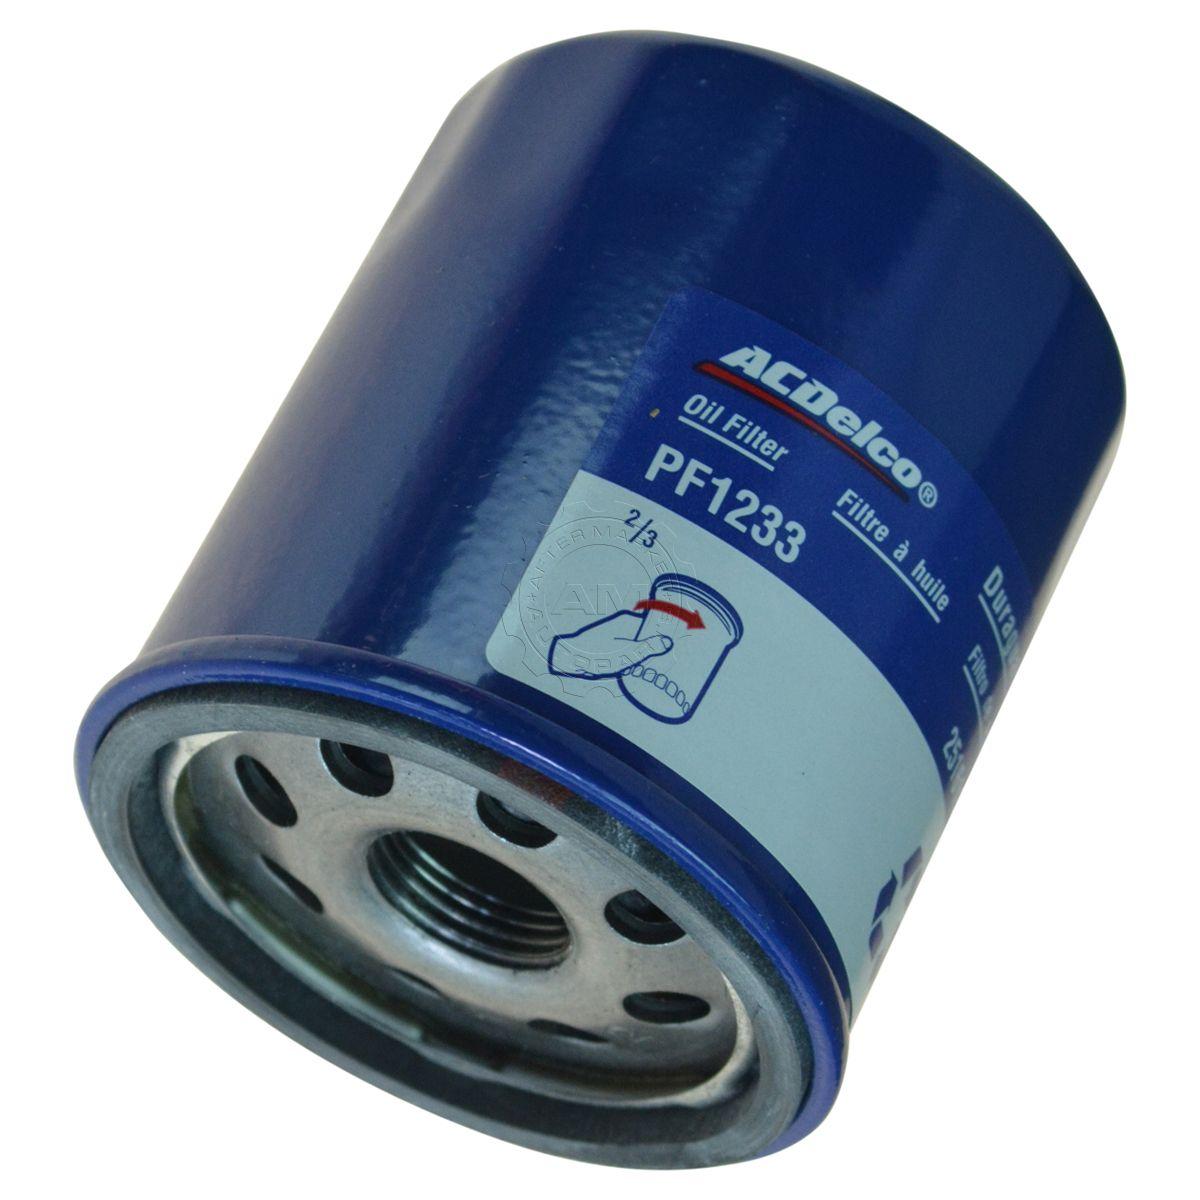 Ac Delco Pf1233 Engine Oil Filter For Chevy Pontiac Geo